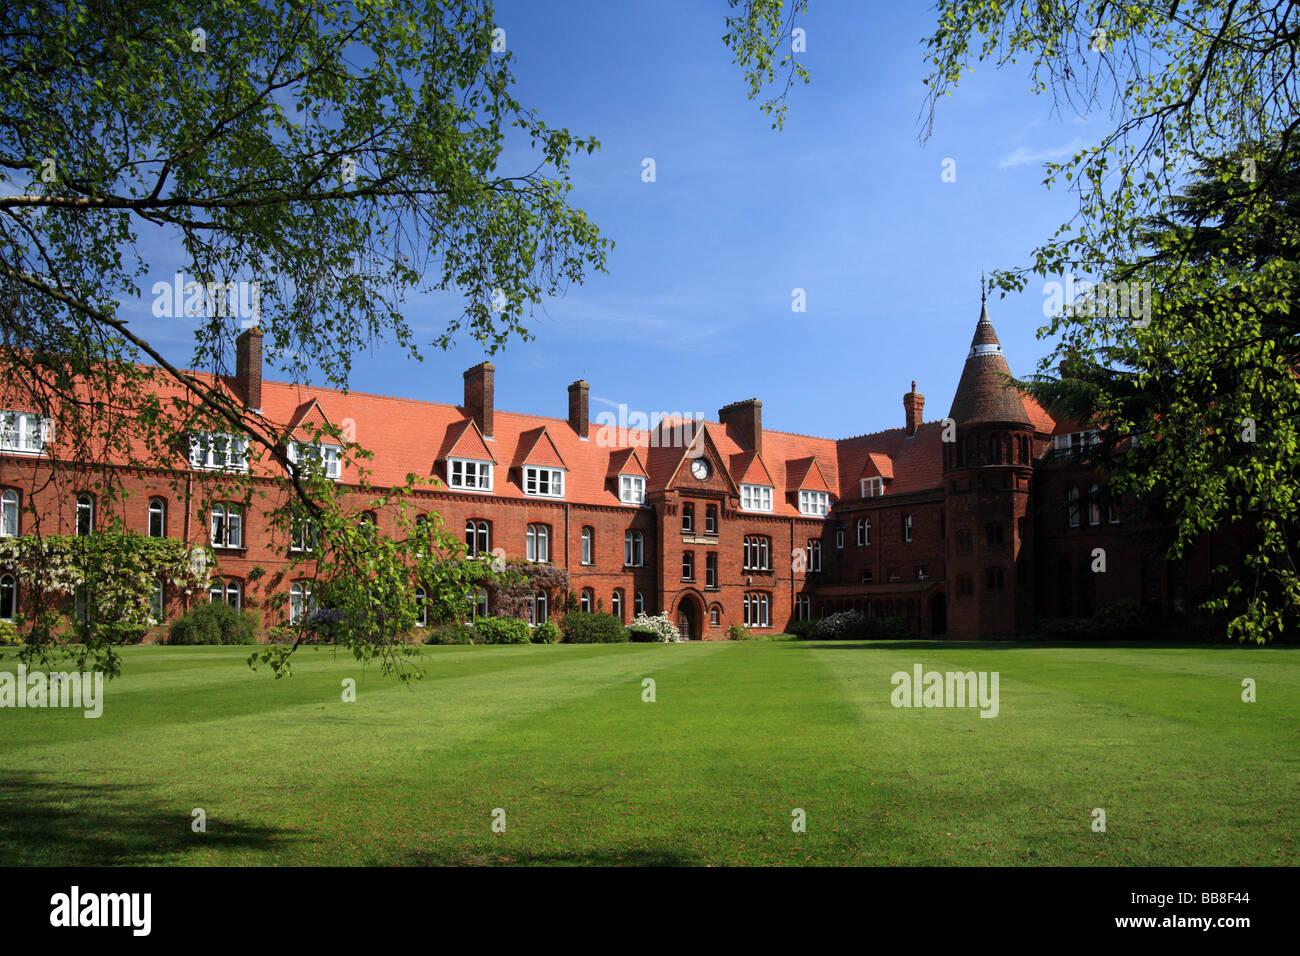 Girton College, University of Cambridge Emily Davies Court, sunny spring day. - Stock Image